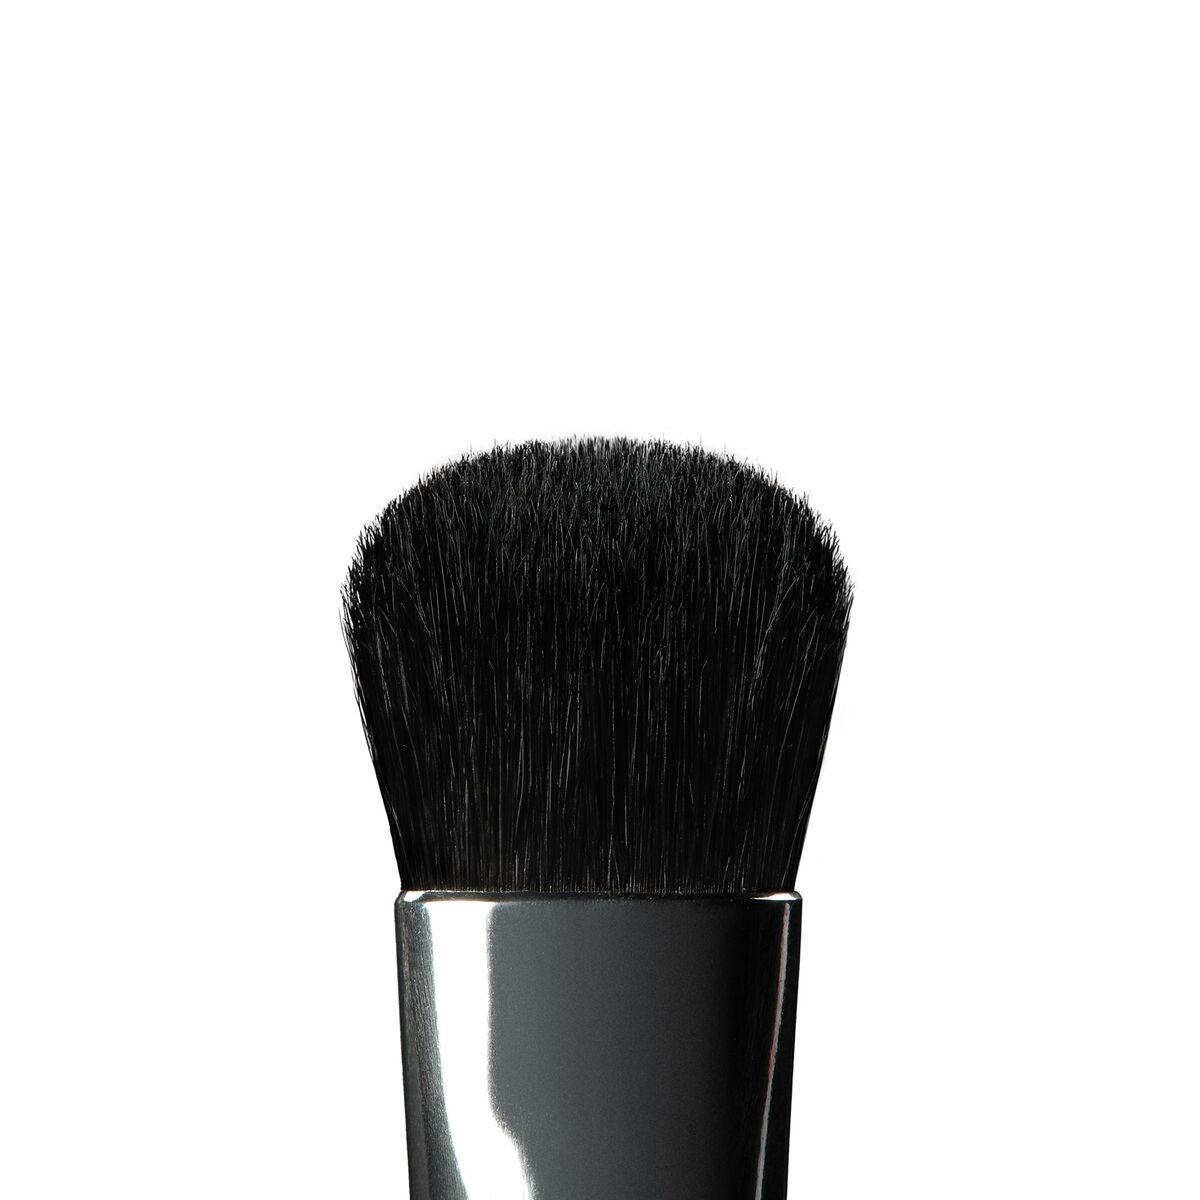 Pro Brush- A13 Medium Shader Brush